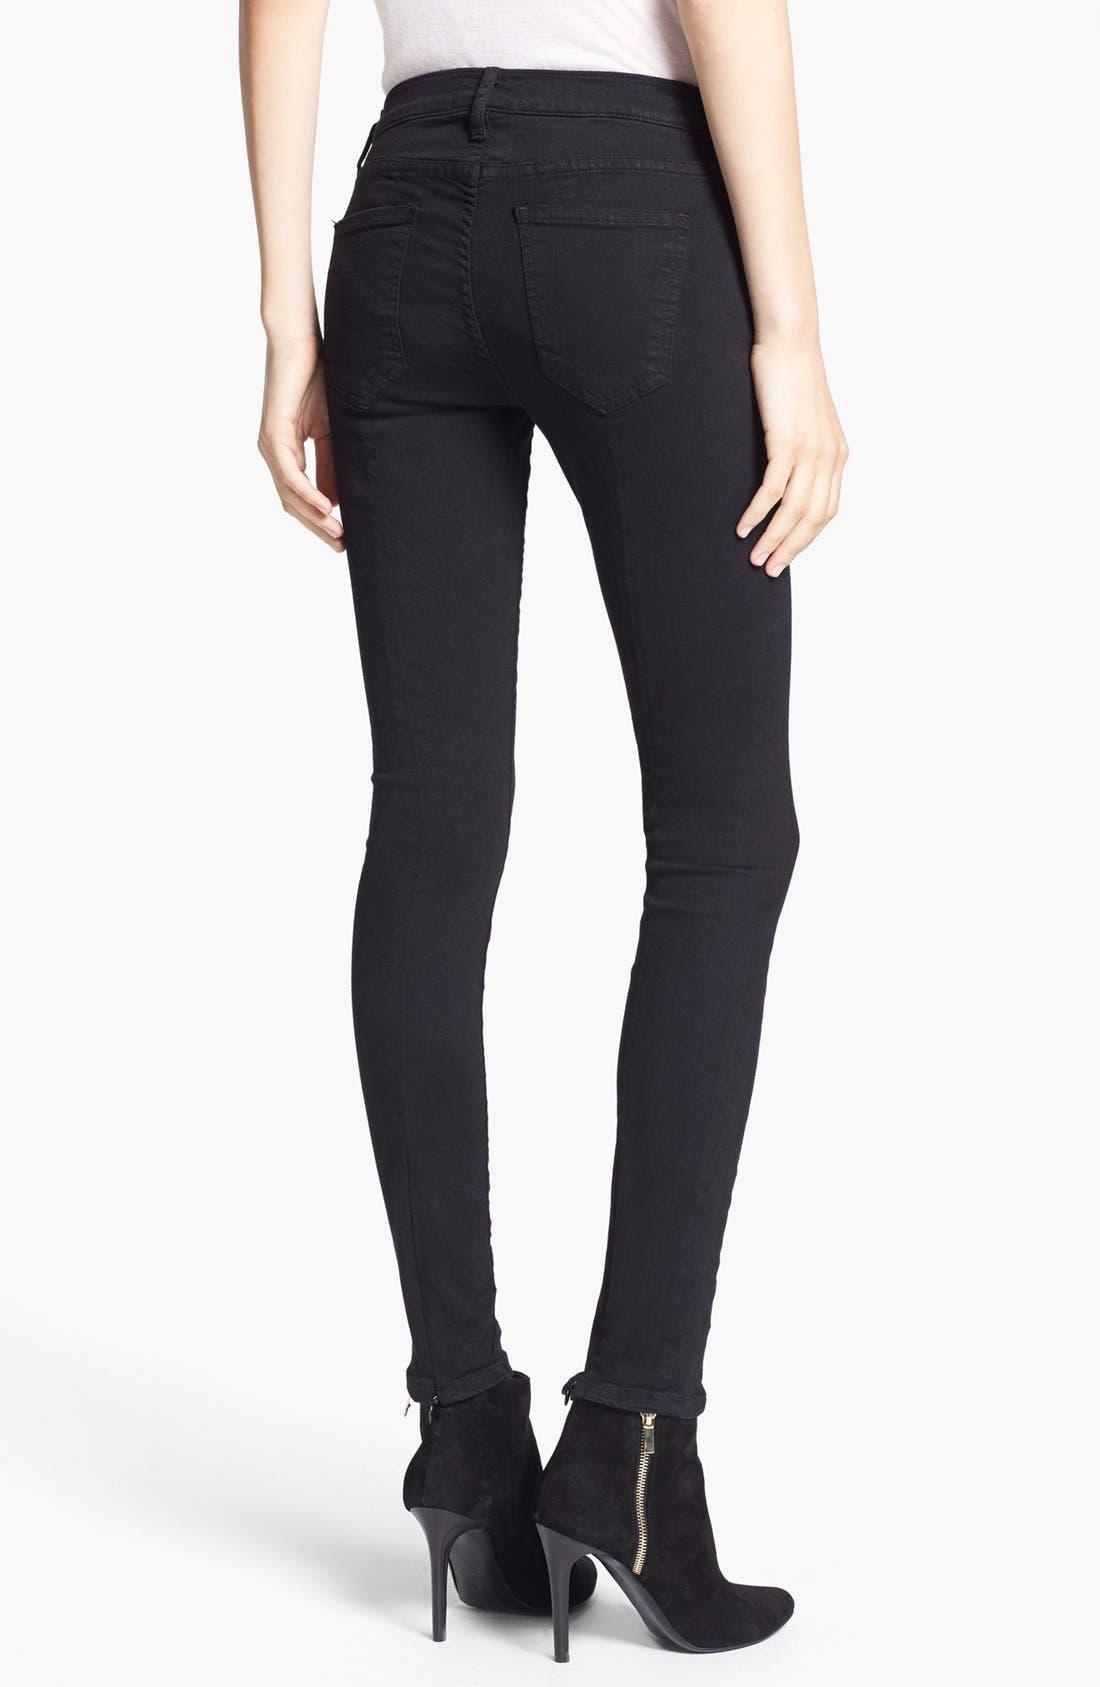 Alternate Image 2  - Current/Elliott 'The Ankle Seamstress' Skinny Jeans (Jet Black)